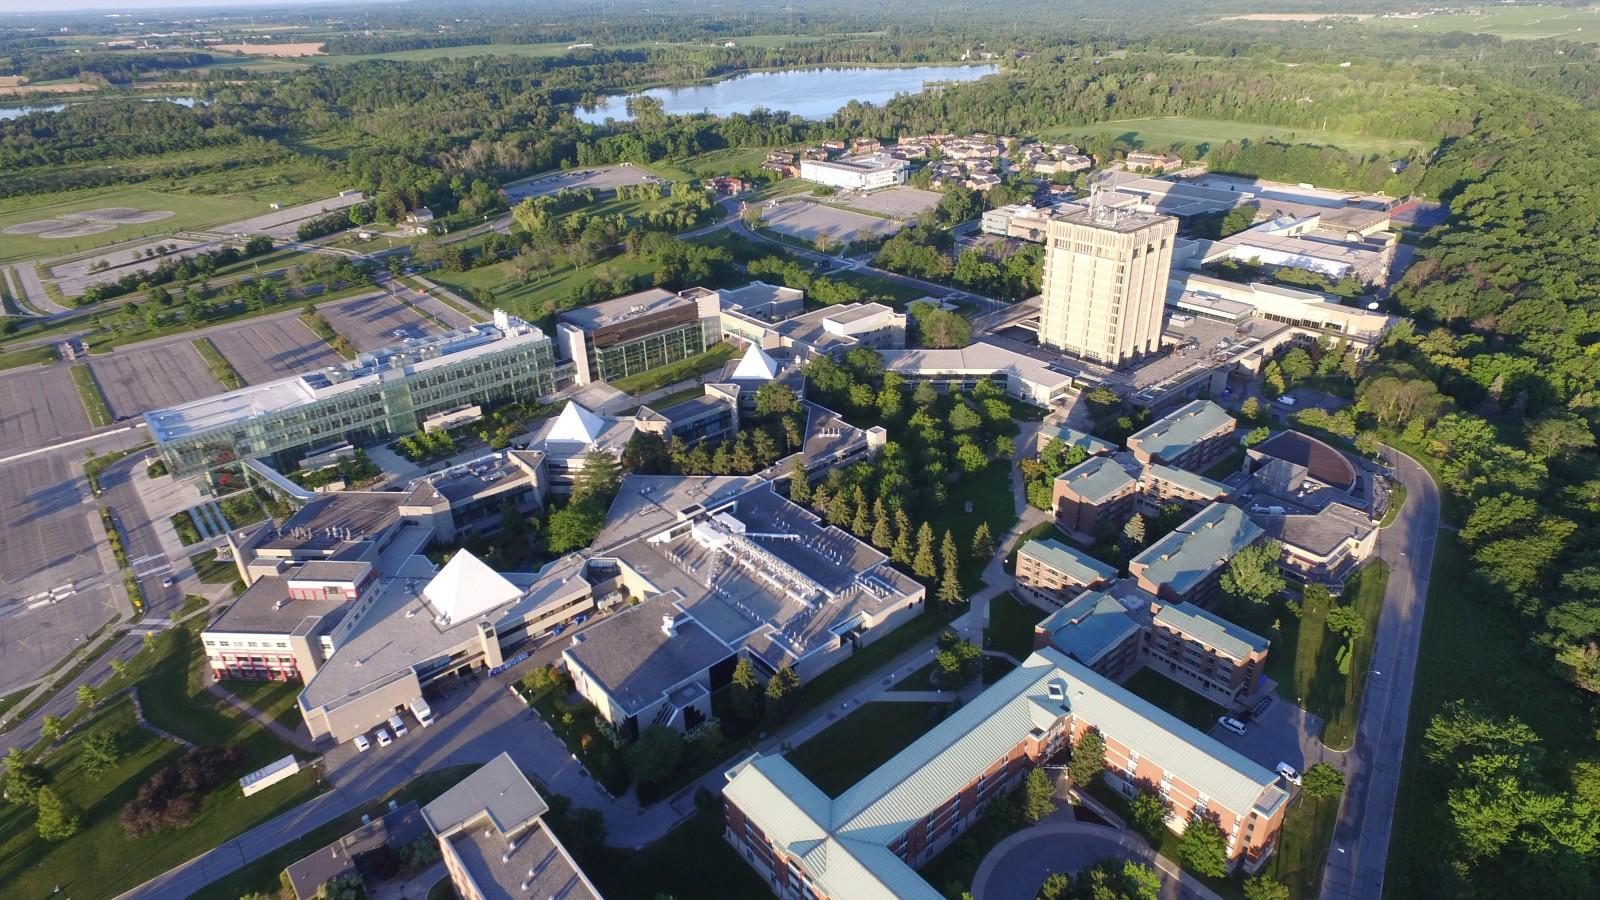 Brock University in St. Catharines, Ontario, Canada